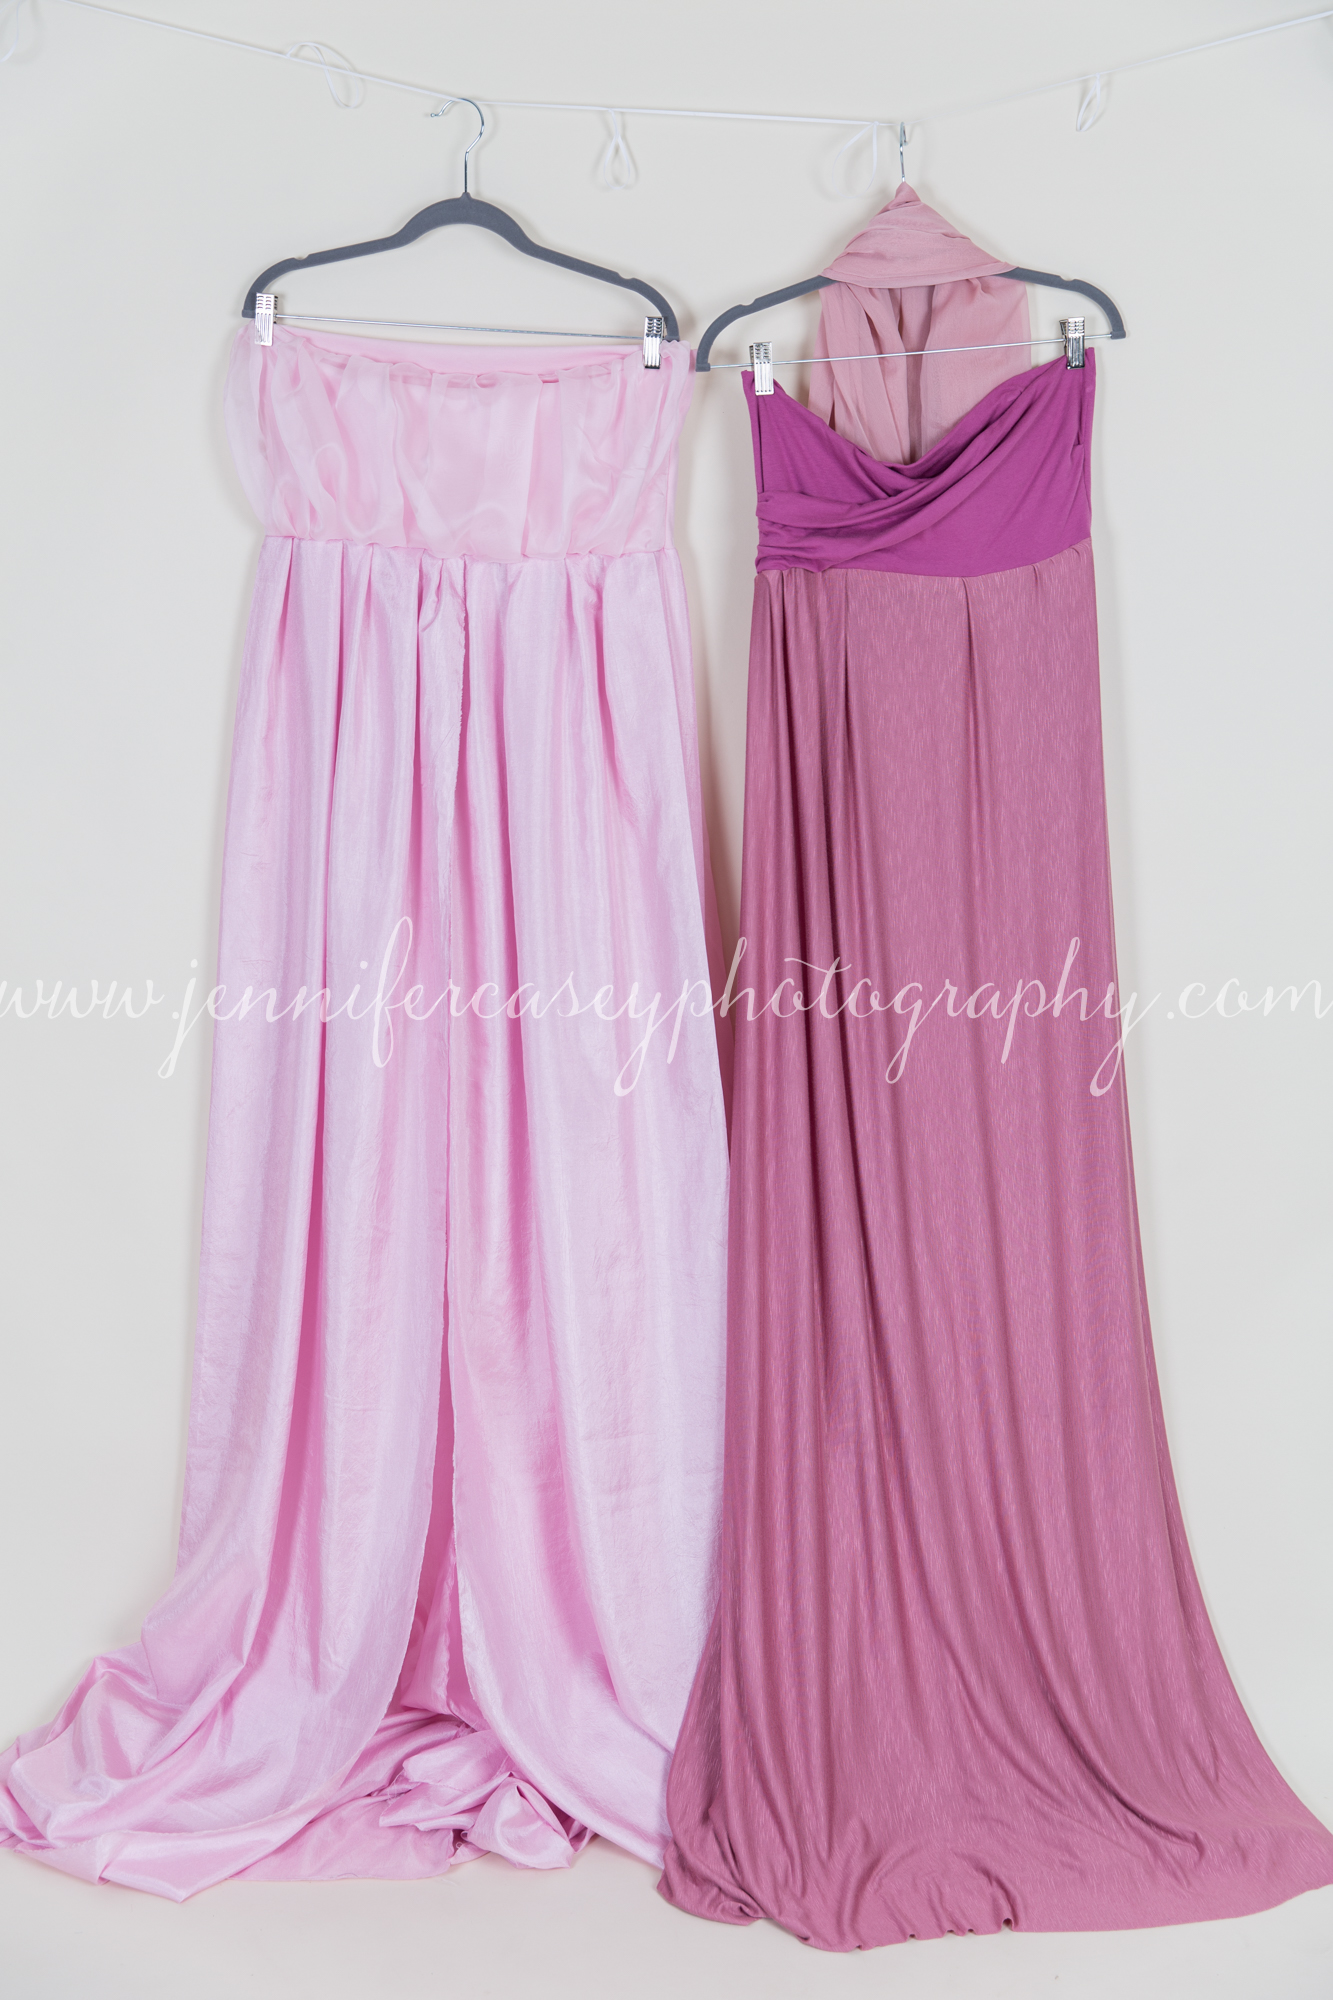 Studio Props Maternity Dresses-7.jpg